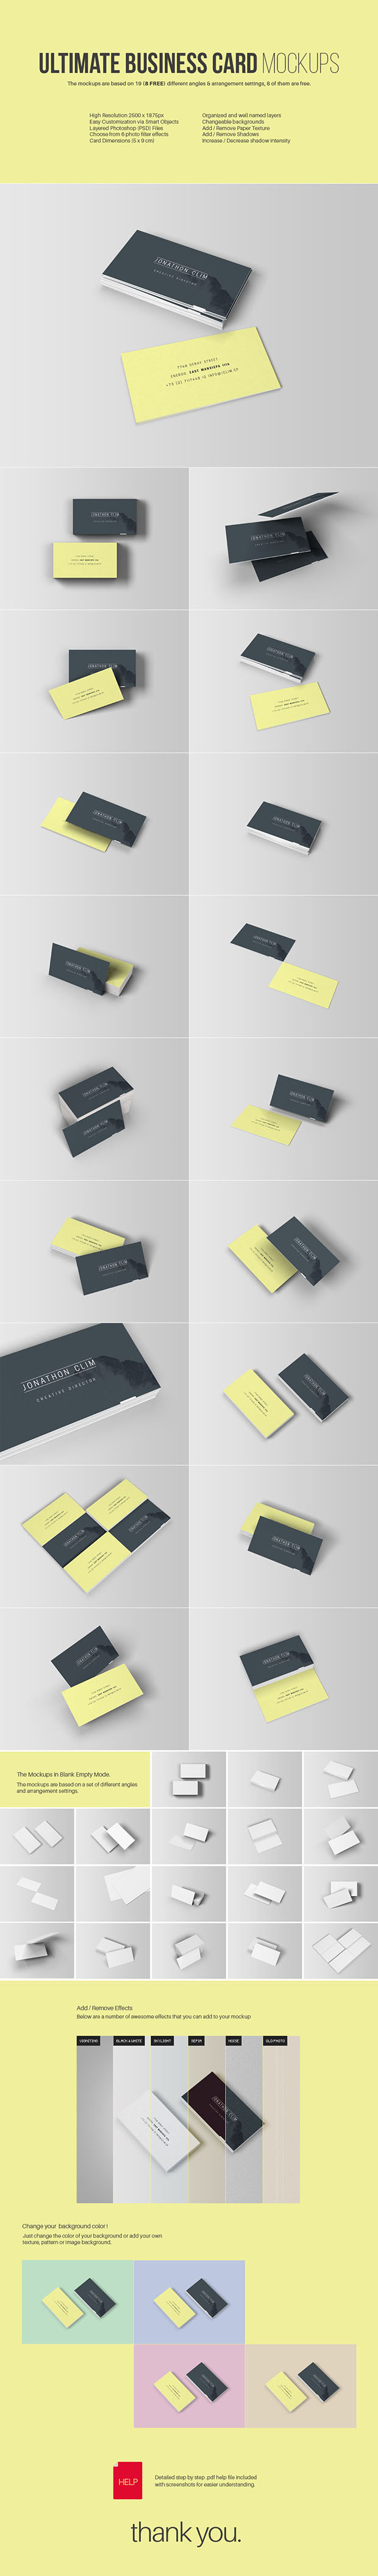 Ultimate-Business-Card-Mockups